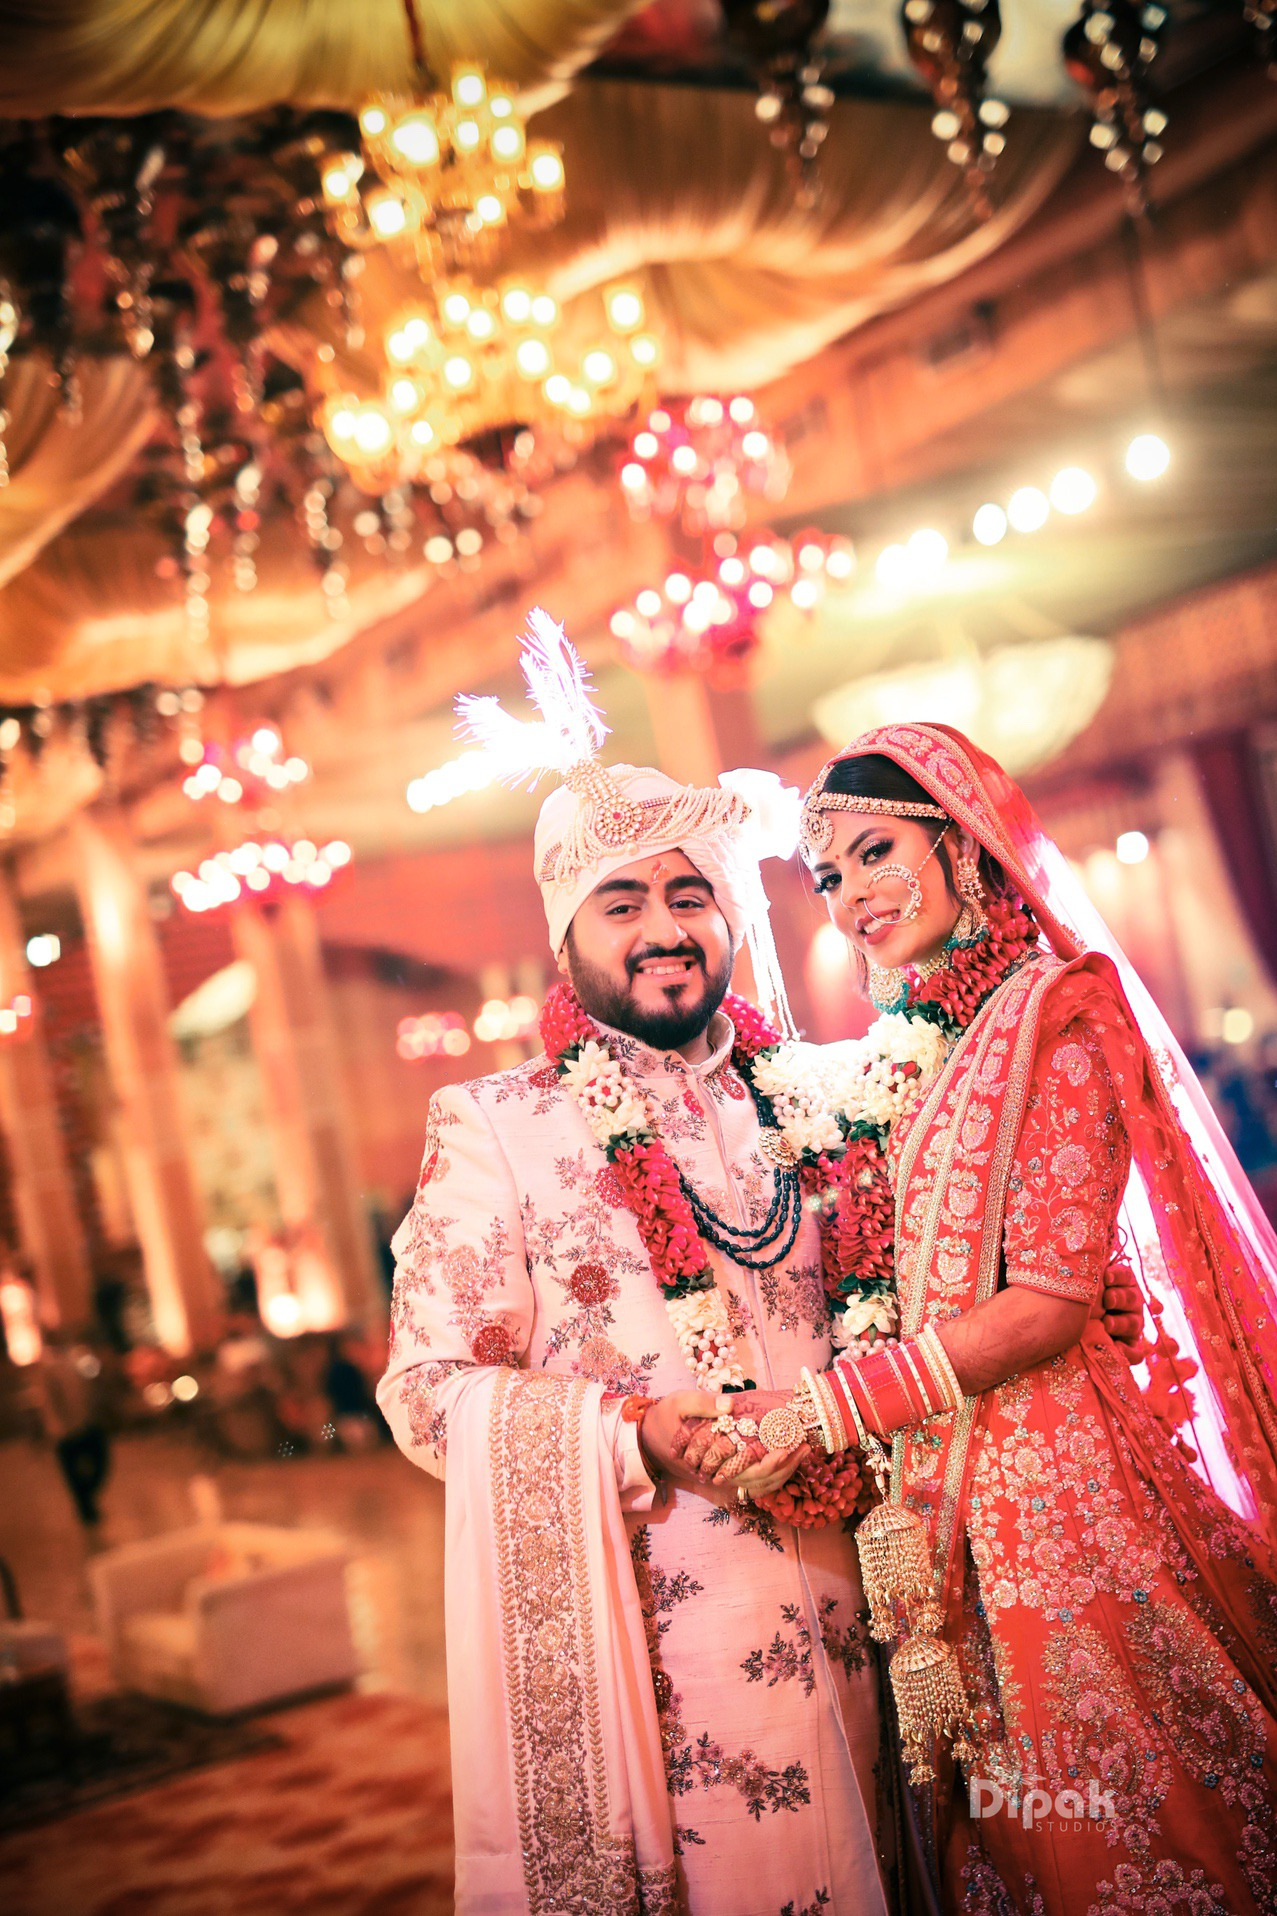 Indian Wedding Couple Photography Couples Of Dipak Studios Couples Photography